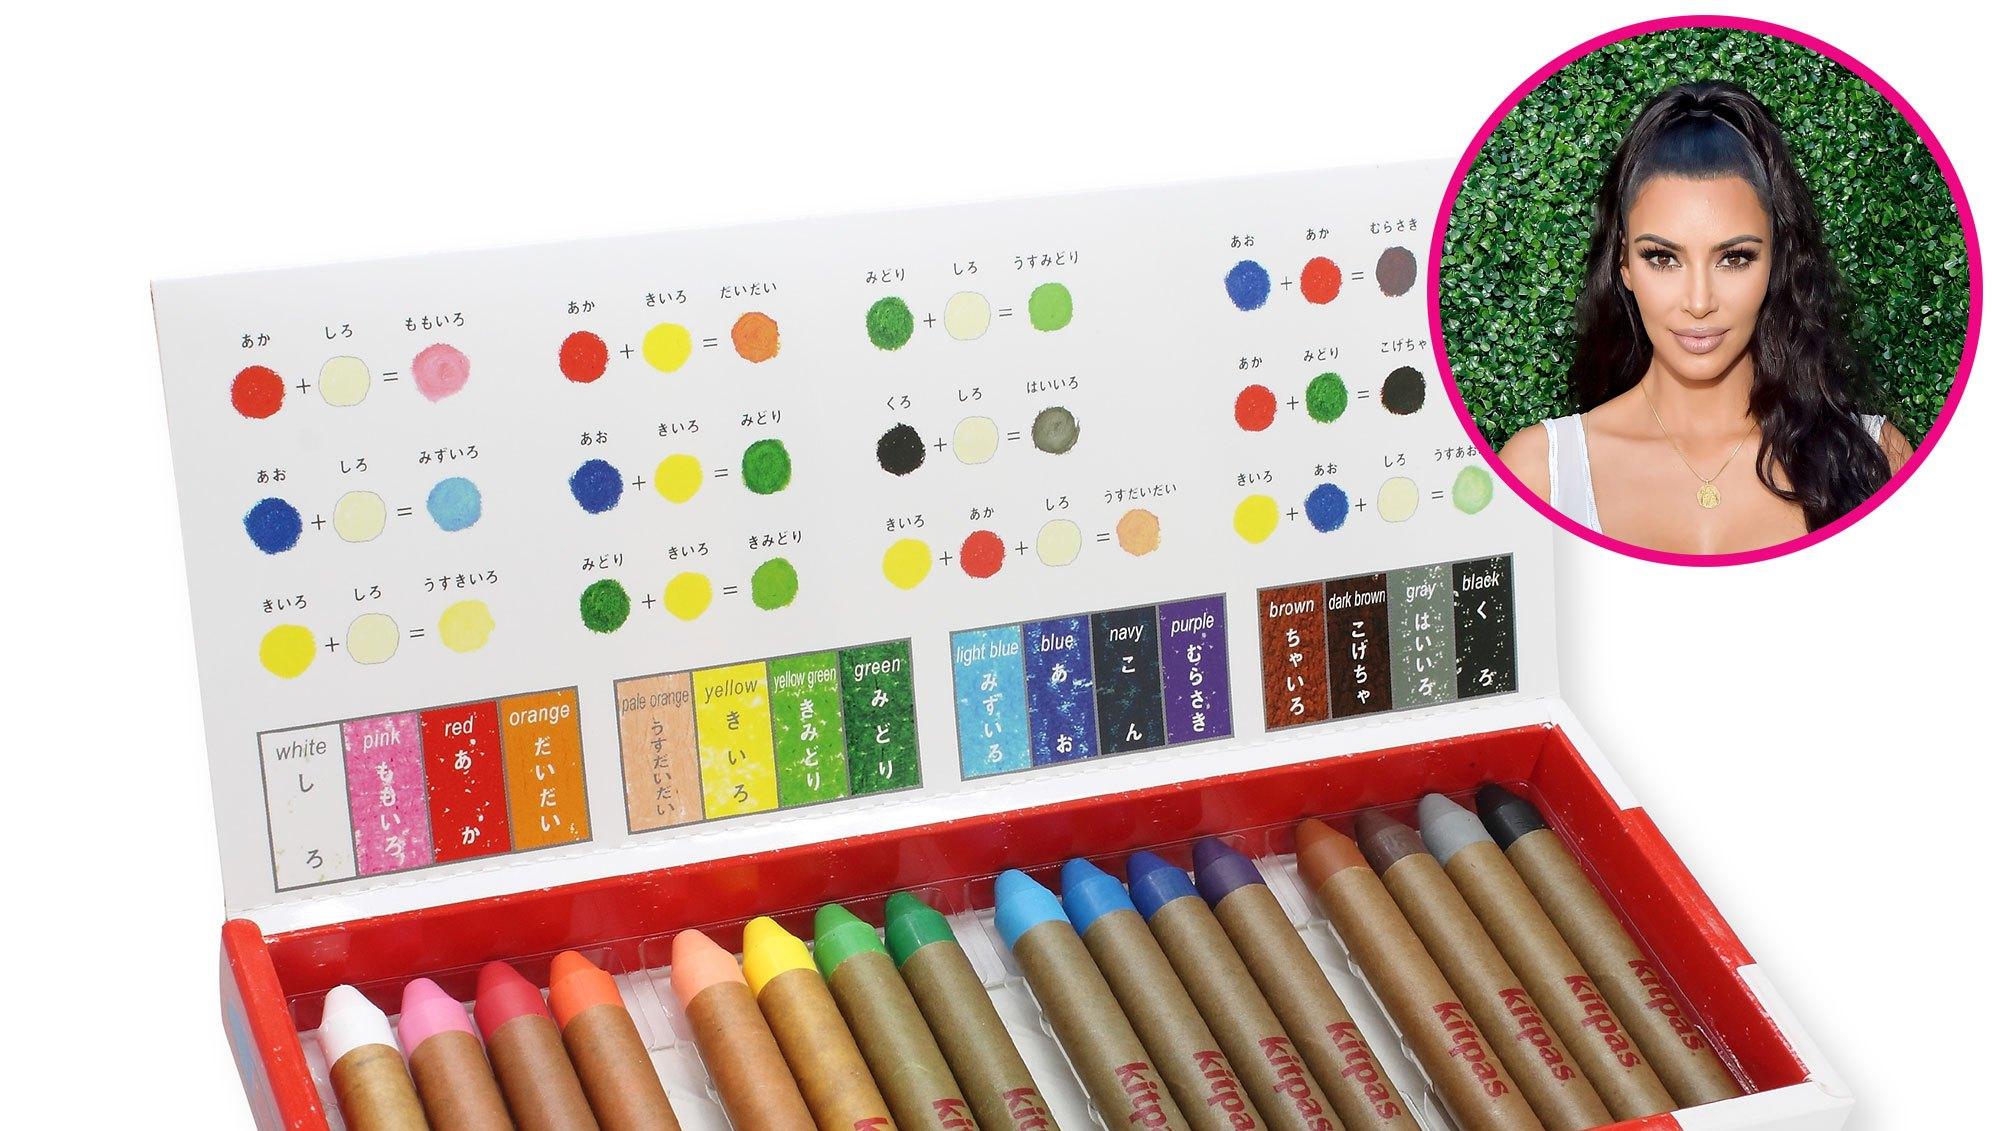 Kitpas Crayons kim kardashian back to school buzzometer